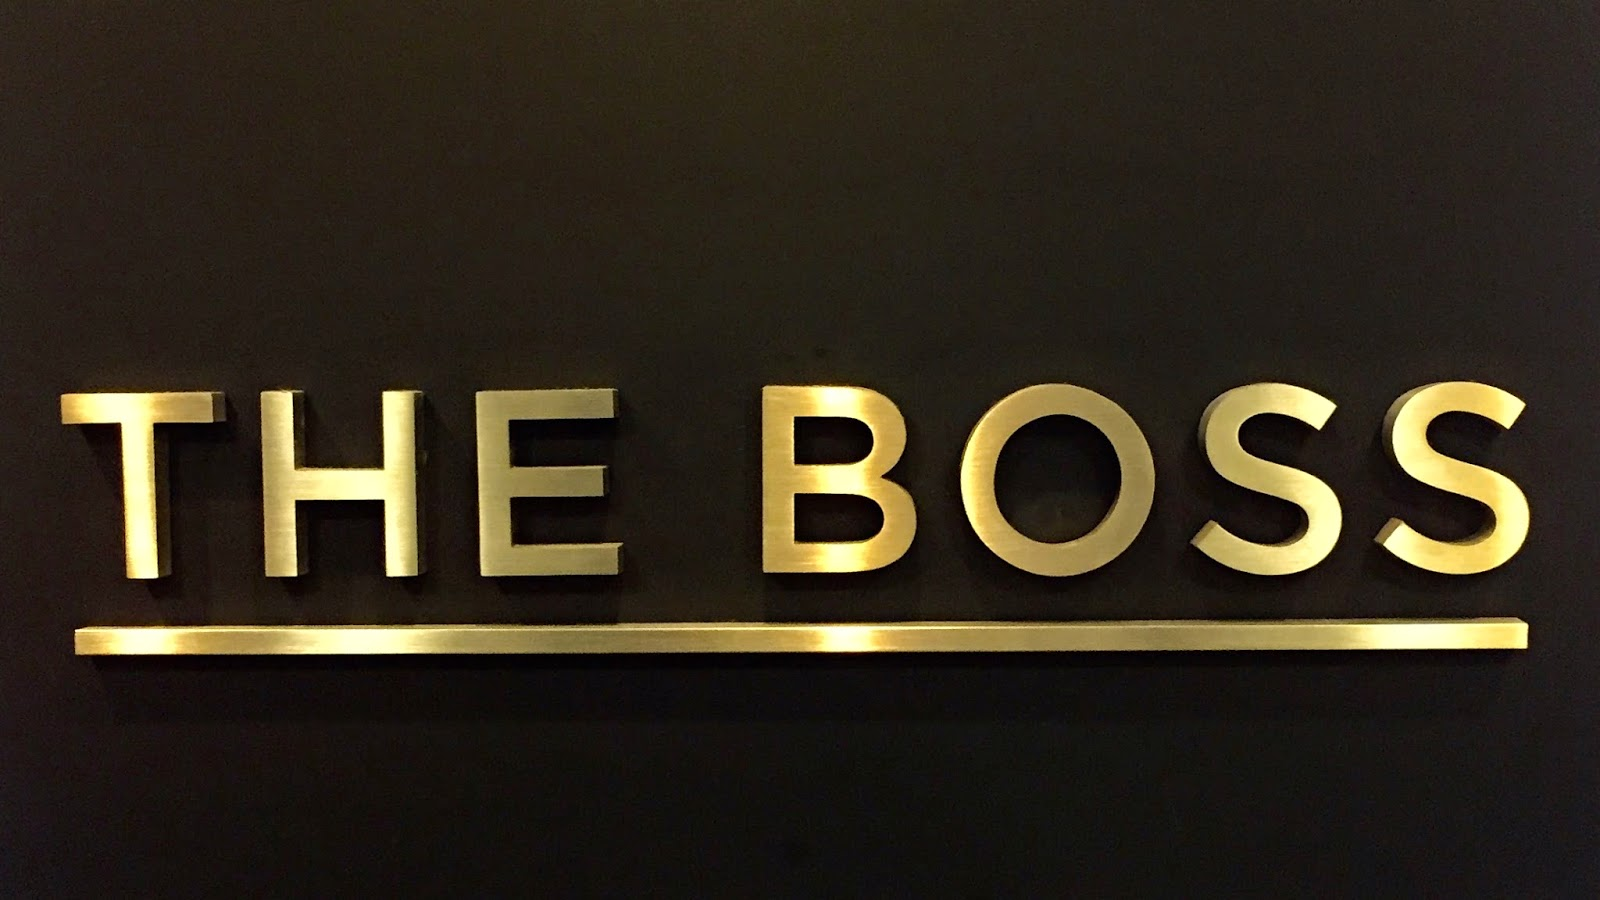 the boss - photo #43